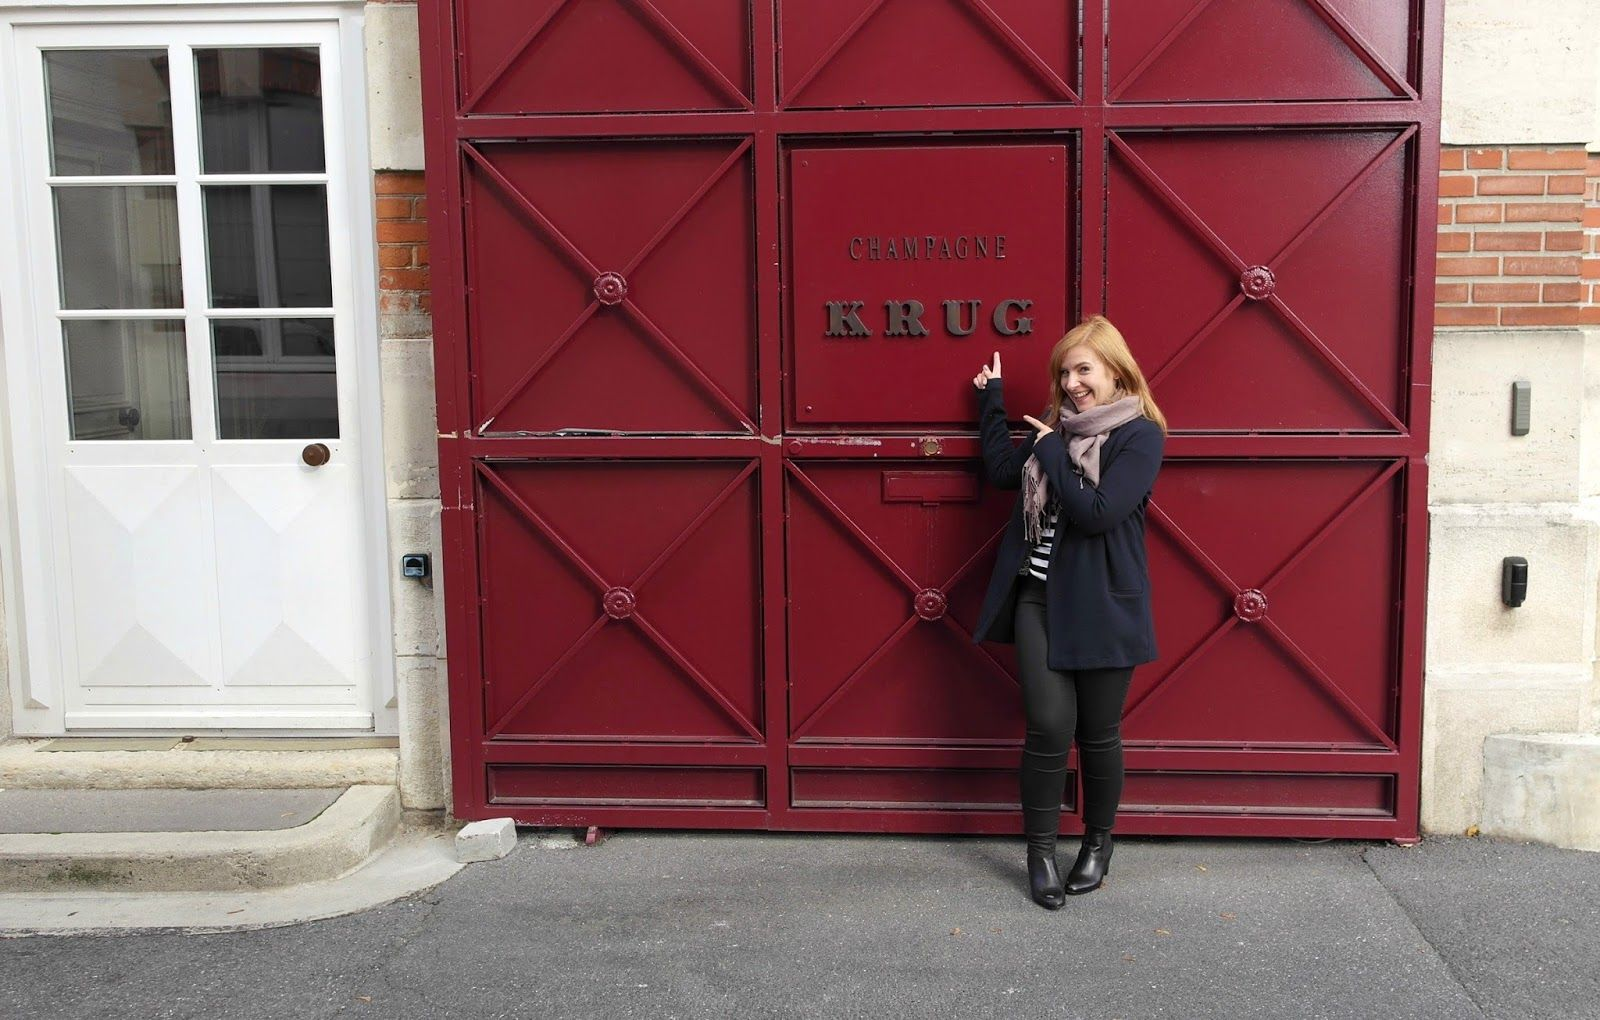 #wineblogger @Blogdeblancs   www.stellarstories.fi @stellarstoriesblog #stellarstoriesblog